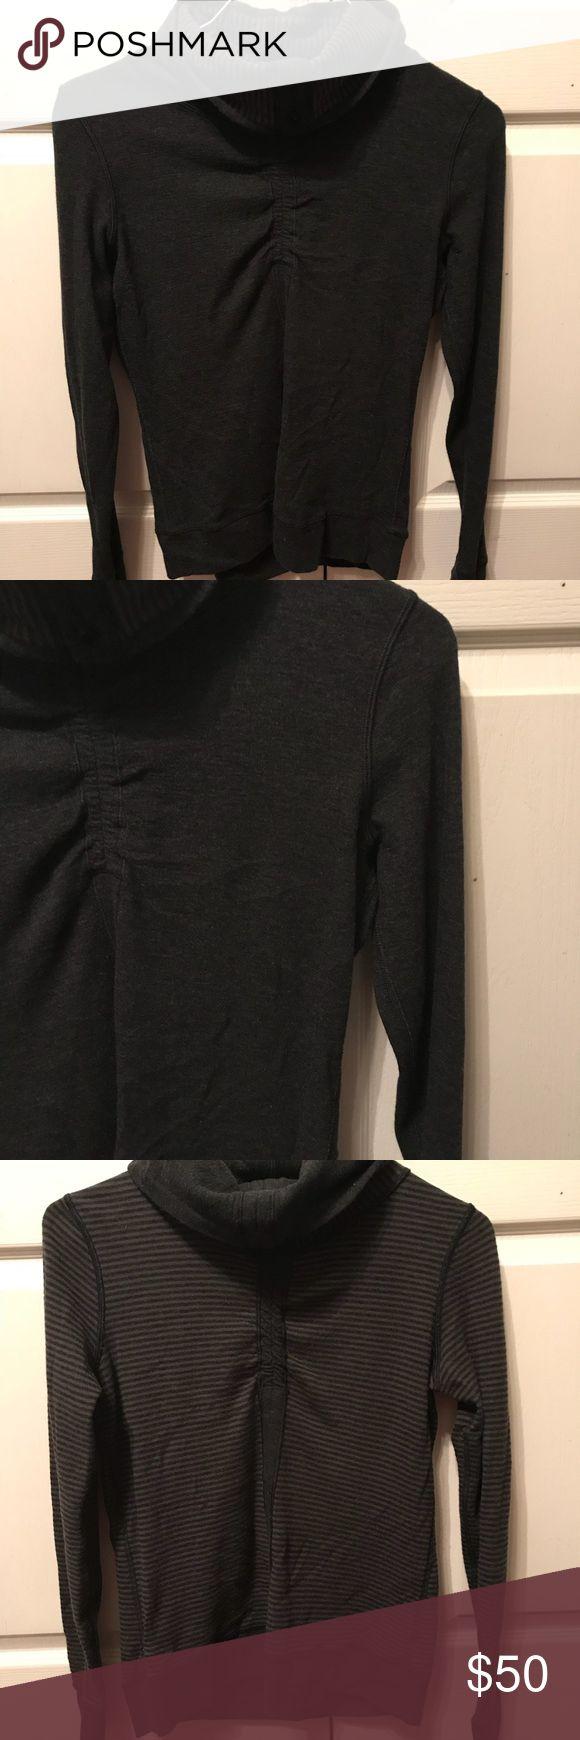 Lululemon reversible sweatshirt. Comfy, fitted reversible sweatshirt with thumb holes. Great for your early morning runs! Good condition. lululemon athletica Tops Sweatshirts & Hoodies